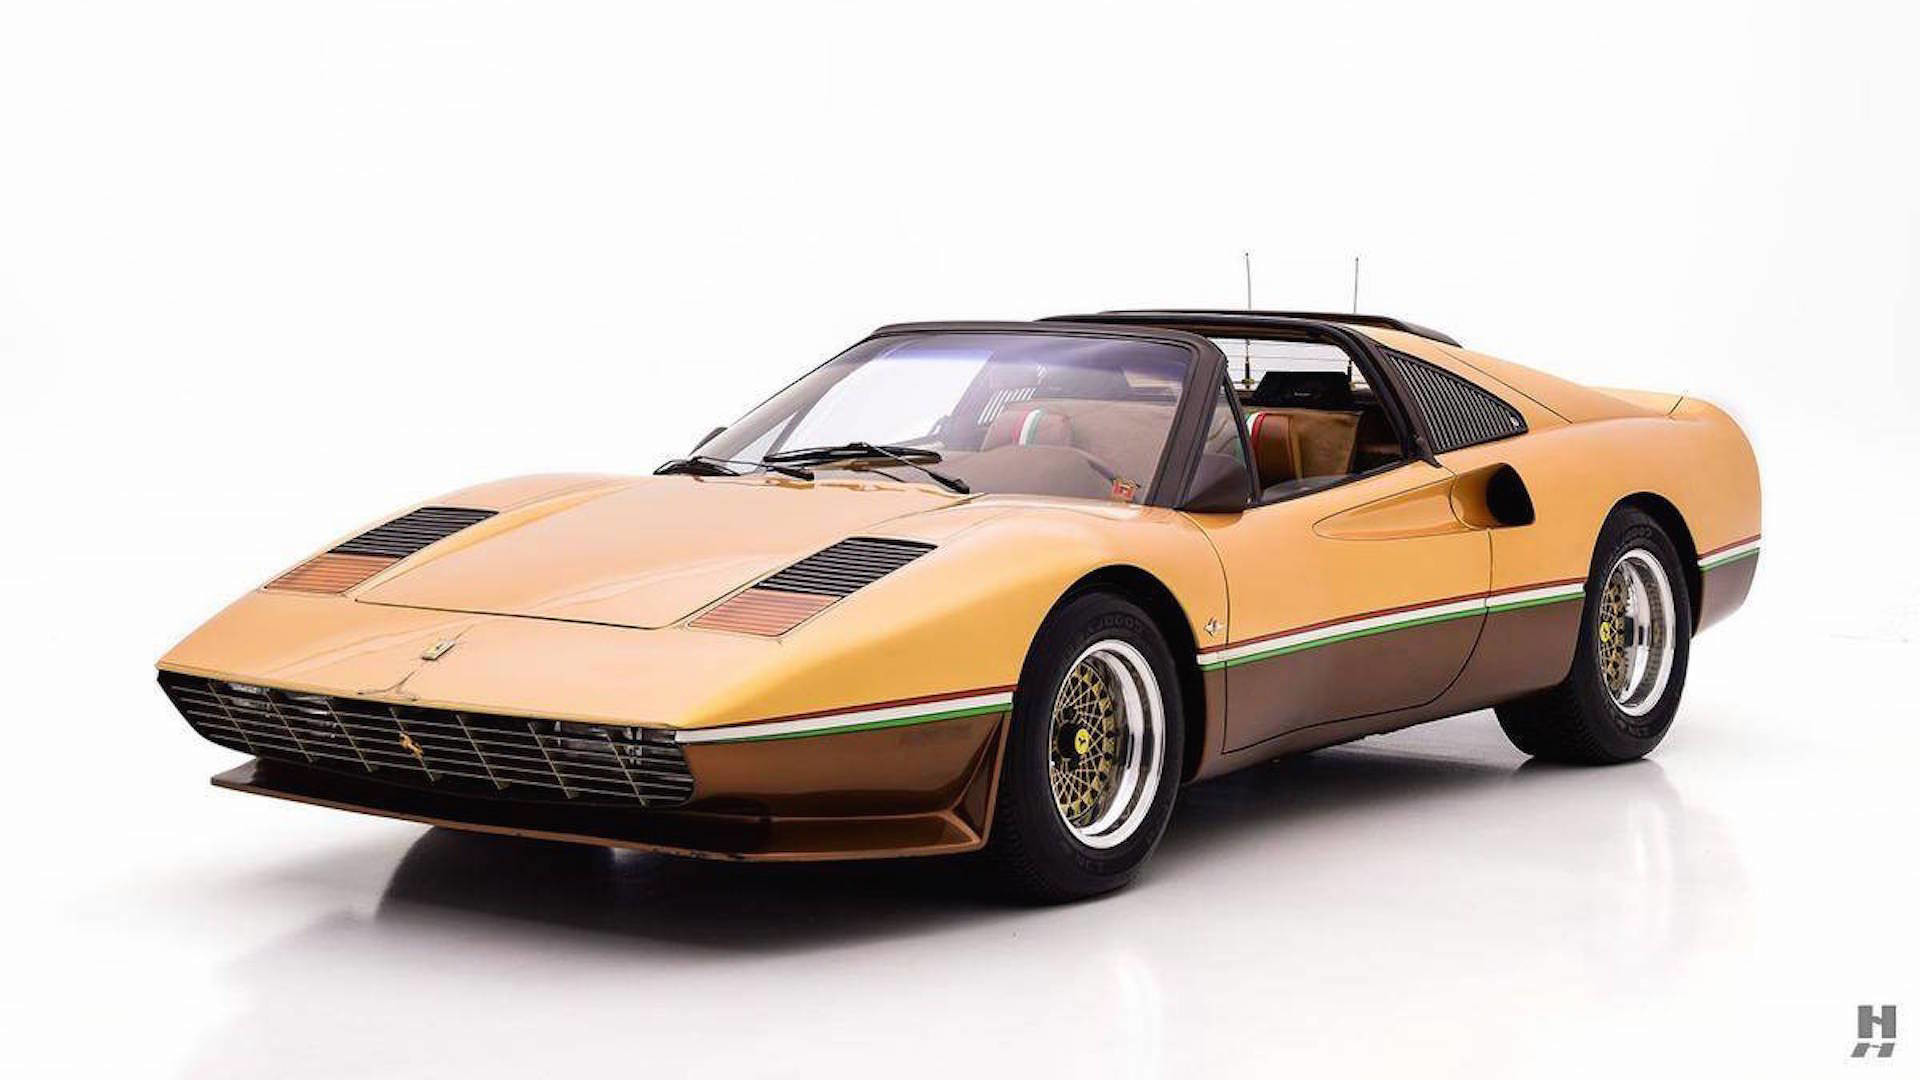 Ferrari 308 Gts For Sale >> Buy George Barris' Crazy Custom Ferrari 308 [44 Photos]